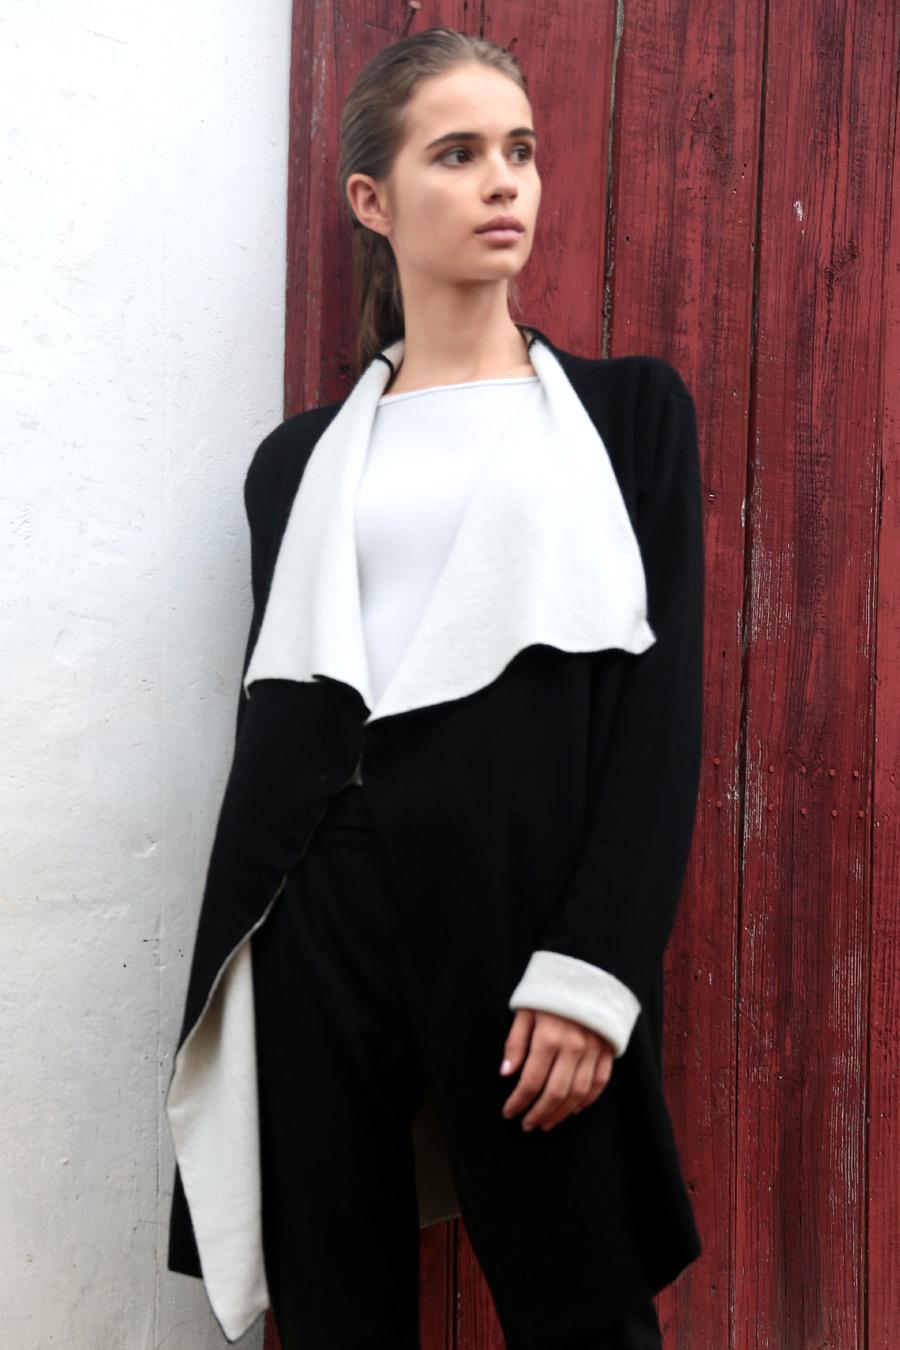 Collection Femme Gilet Cachemire - Automne hiver 2015/16